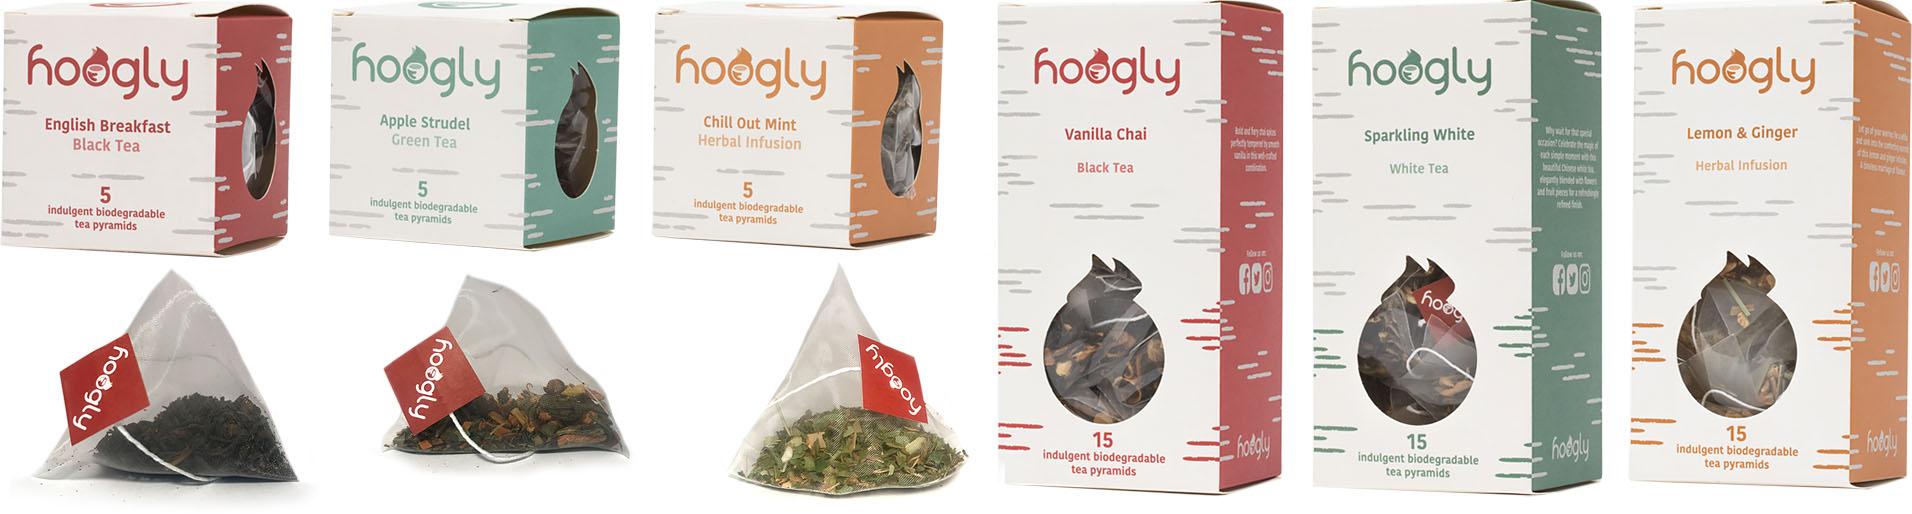 Hoogly Tea 3 - the artisan food trail